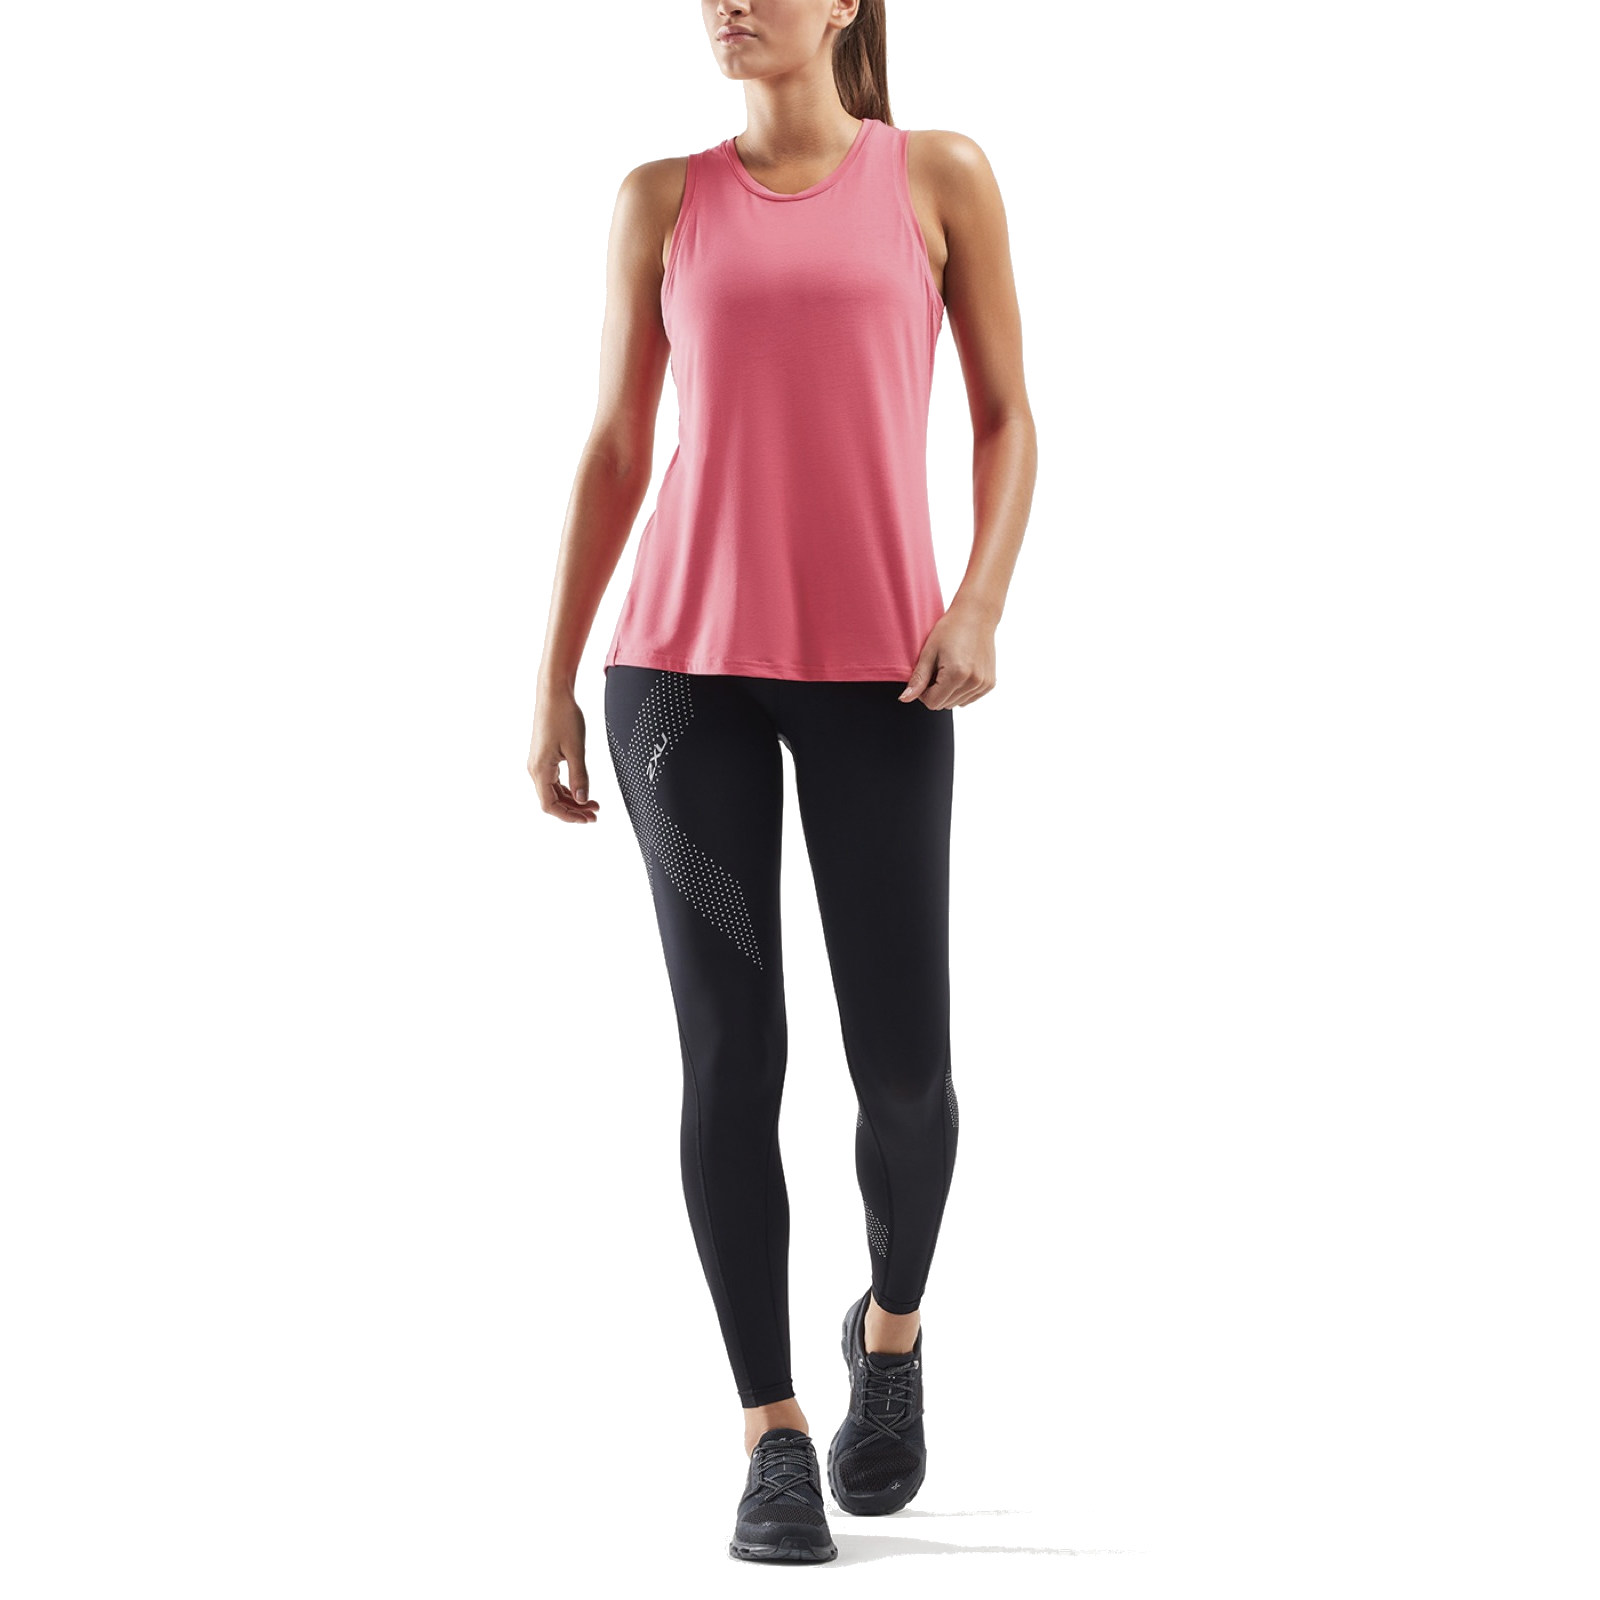 Imagen de 2XU CONTENDER Camiseta de Tirantes Mujer - pink lift/blossom camo